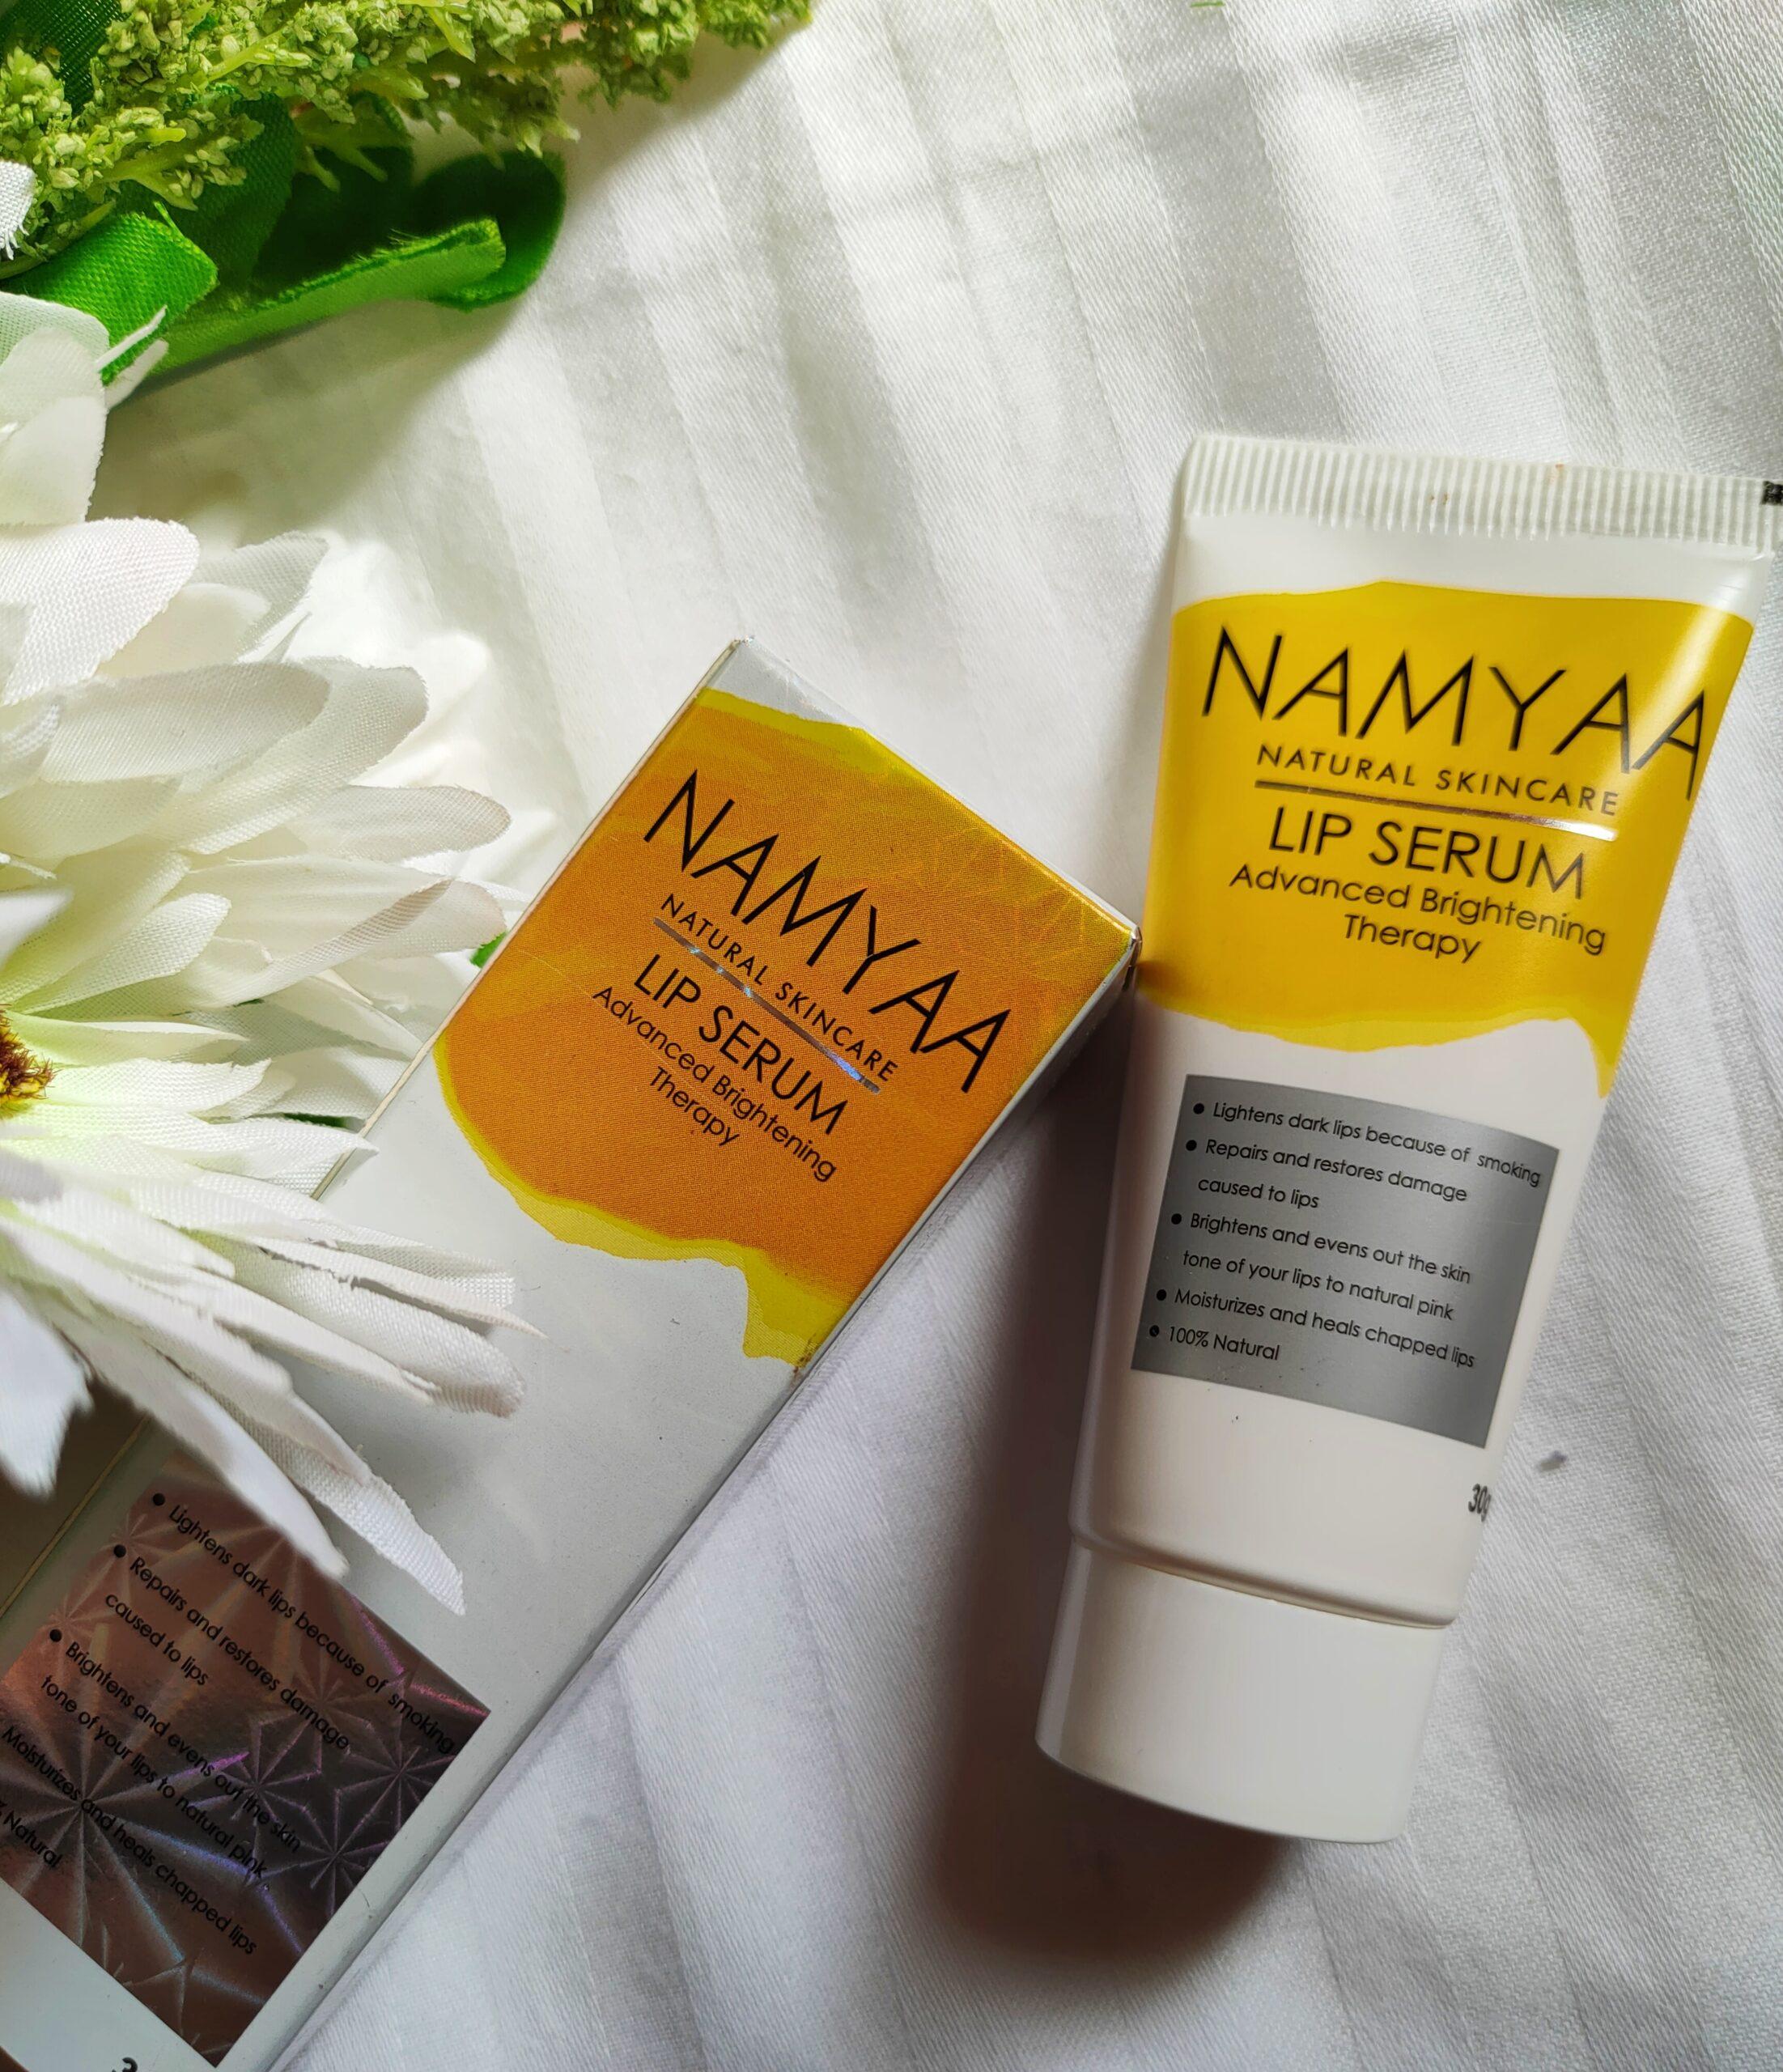 Namyaa Natural Skincare Lip Serum Review